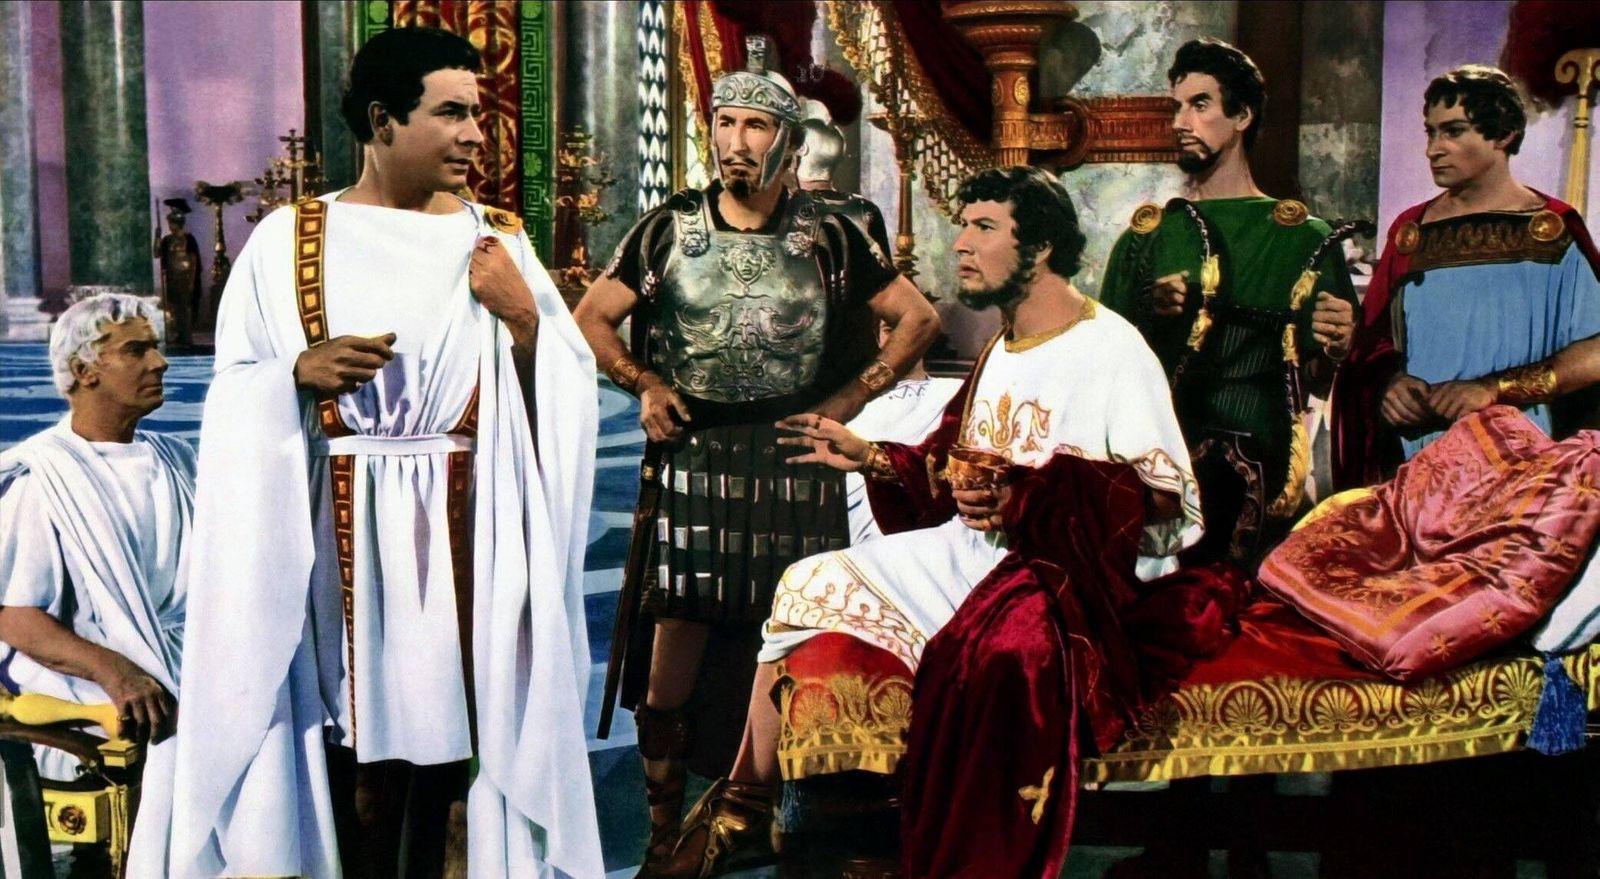 Leo Genn & Peter Ustinov Characters: Petronius & Nero Film: Quo Vadis (USA 1951) Director: Mervyn Leroy 23 February 1951